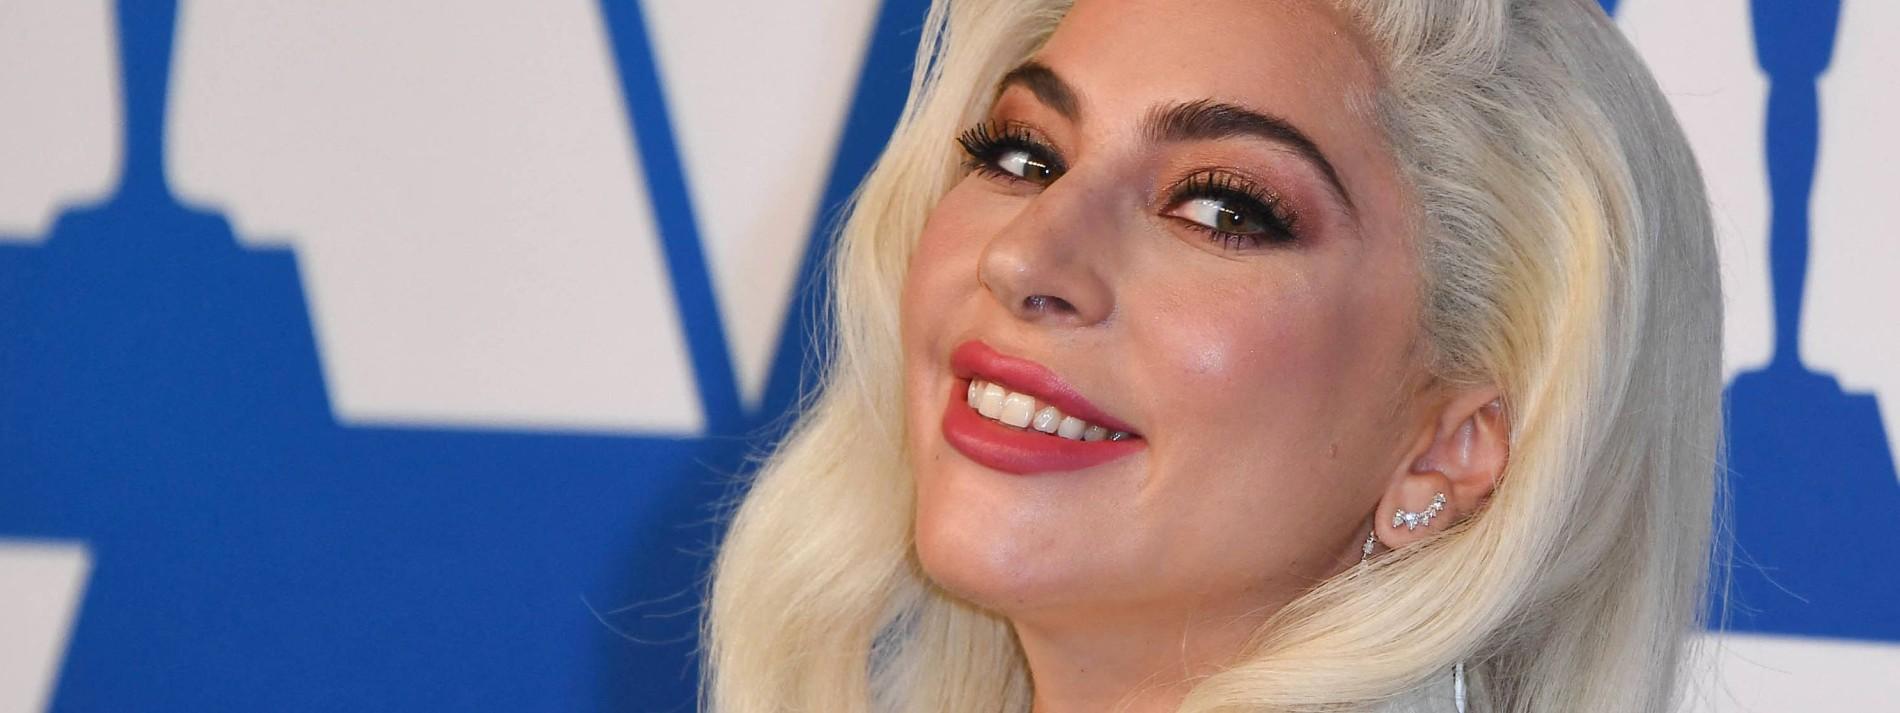 Lady Gagas Hunde nach bewaffnetem Überfall wieder zuhause